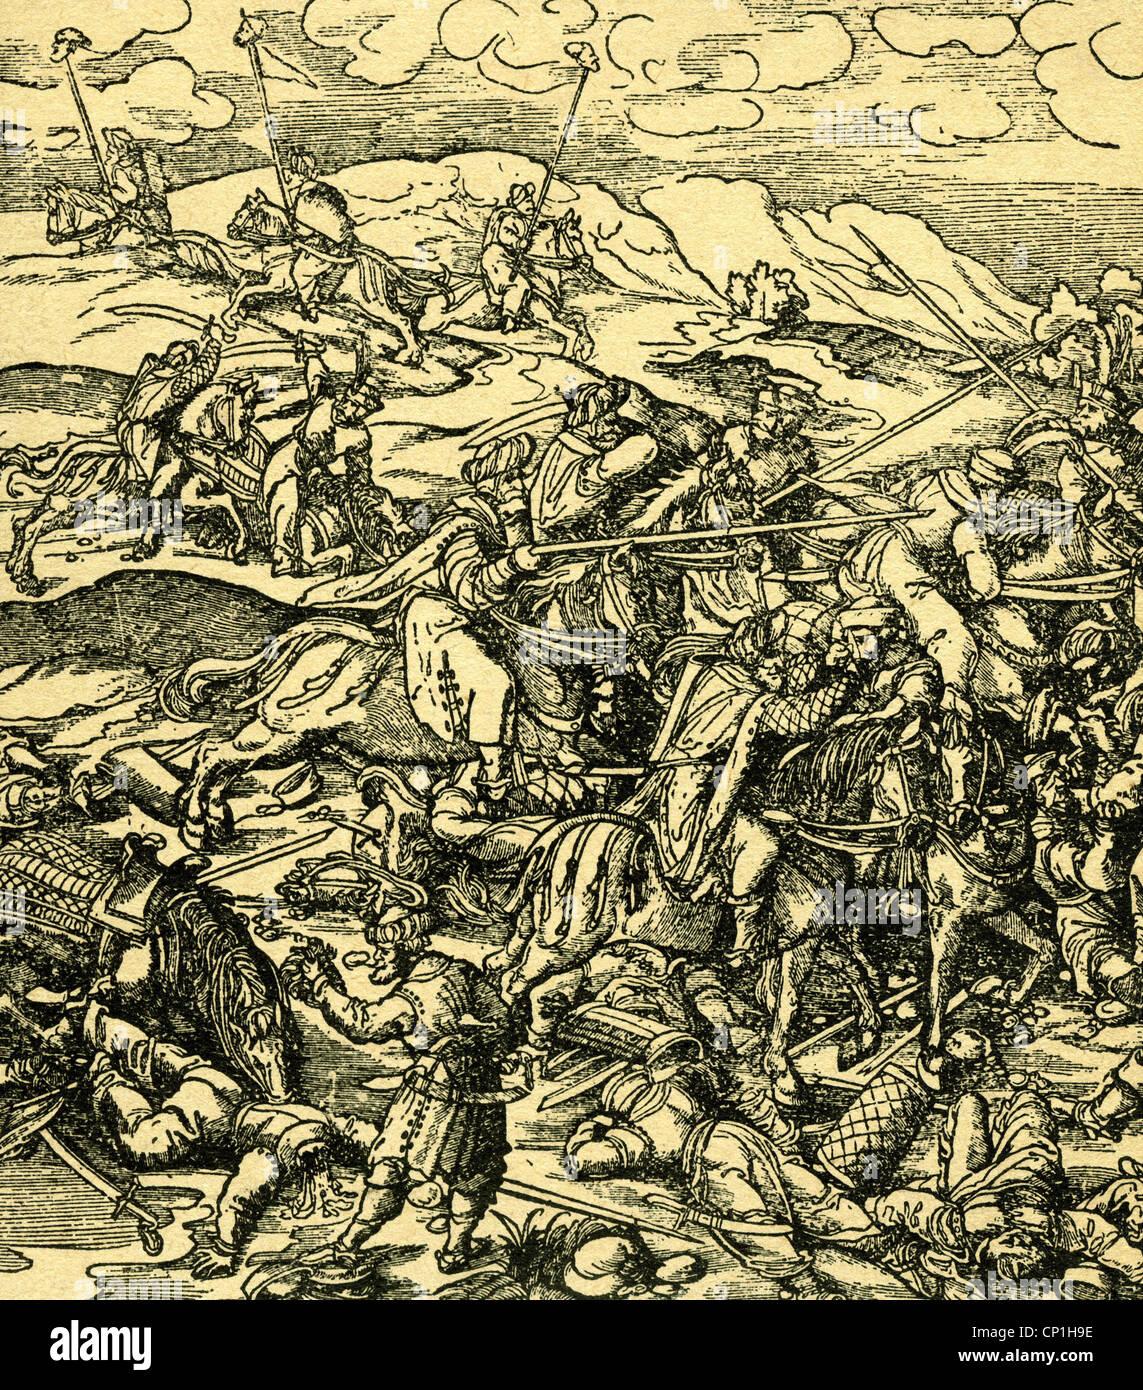 events, Ottoman Wars, battle scene, woodcut, circa 16th century, historic, historical, Ottomans, Ottoman Empire, - Stock Image